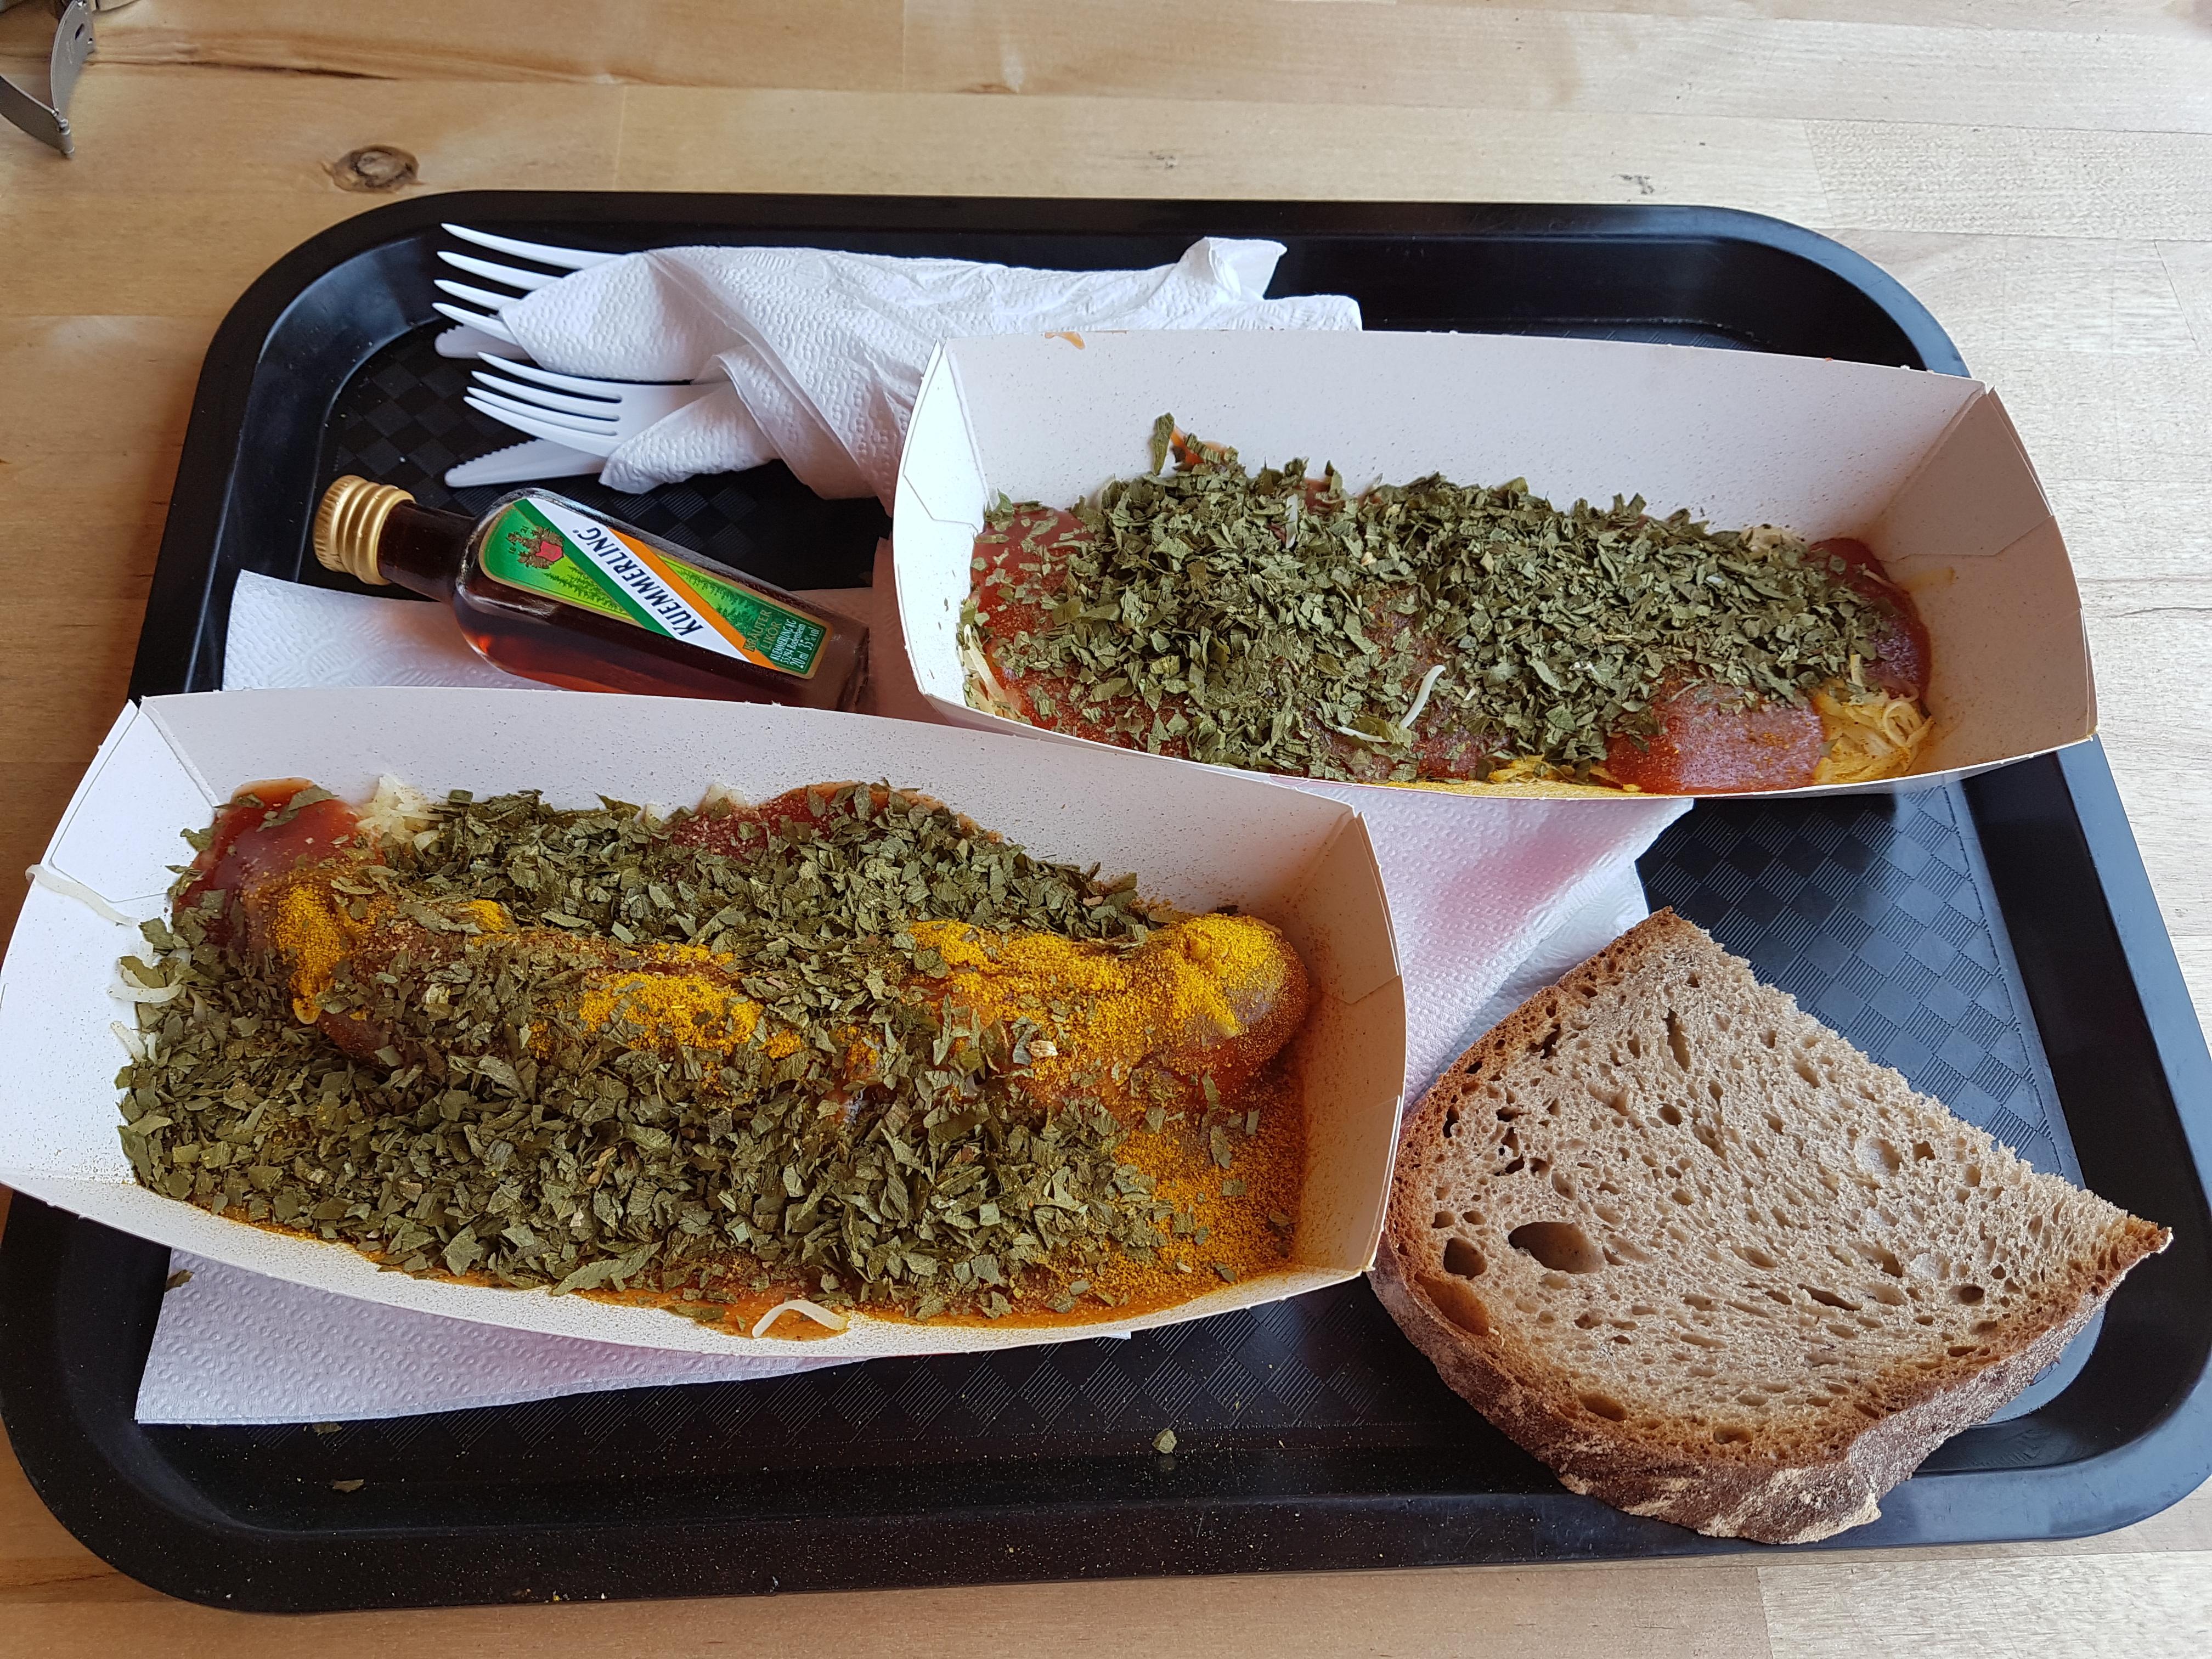 http://foodloader.net/Holz_2017-06-17_DJ_Duese_Wurst.jpg